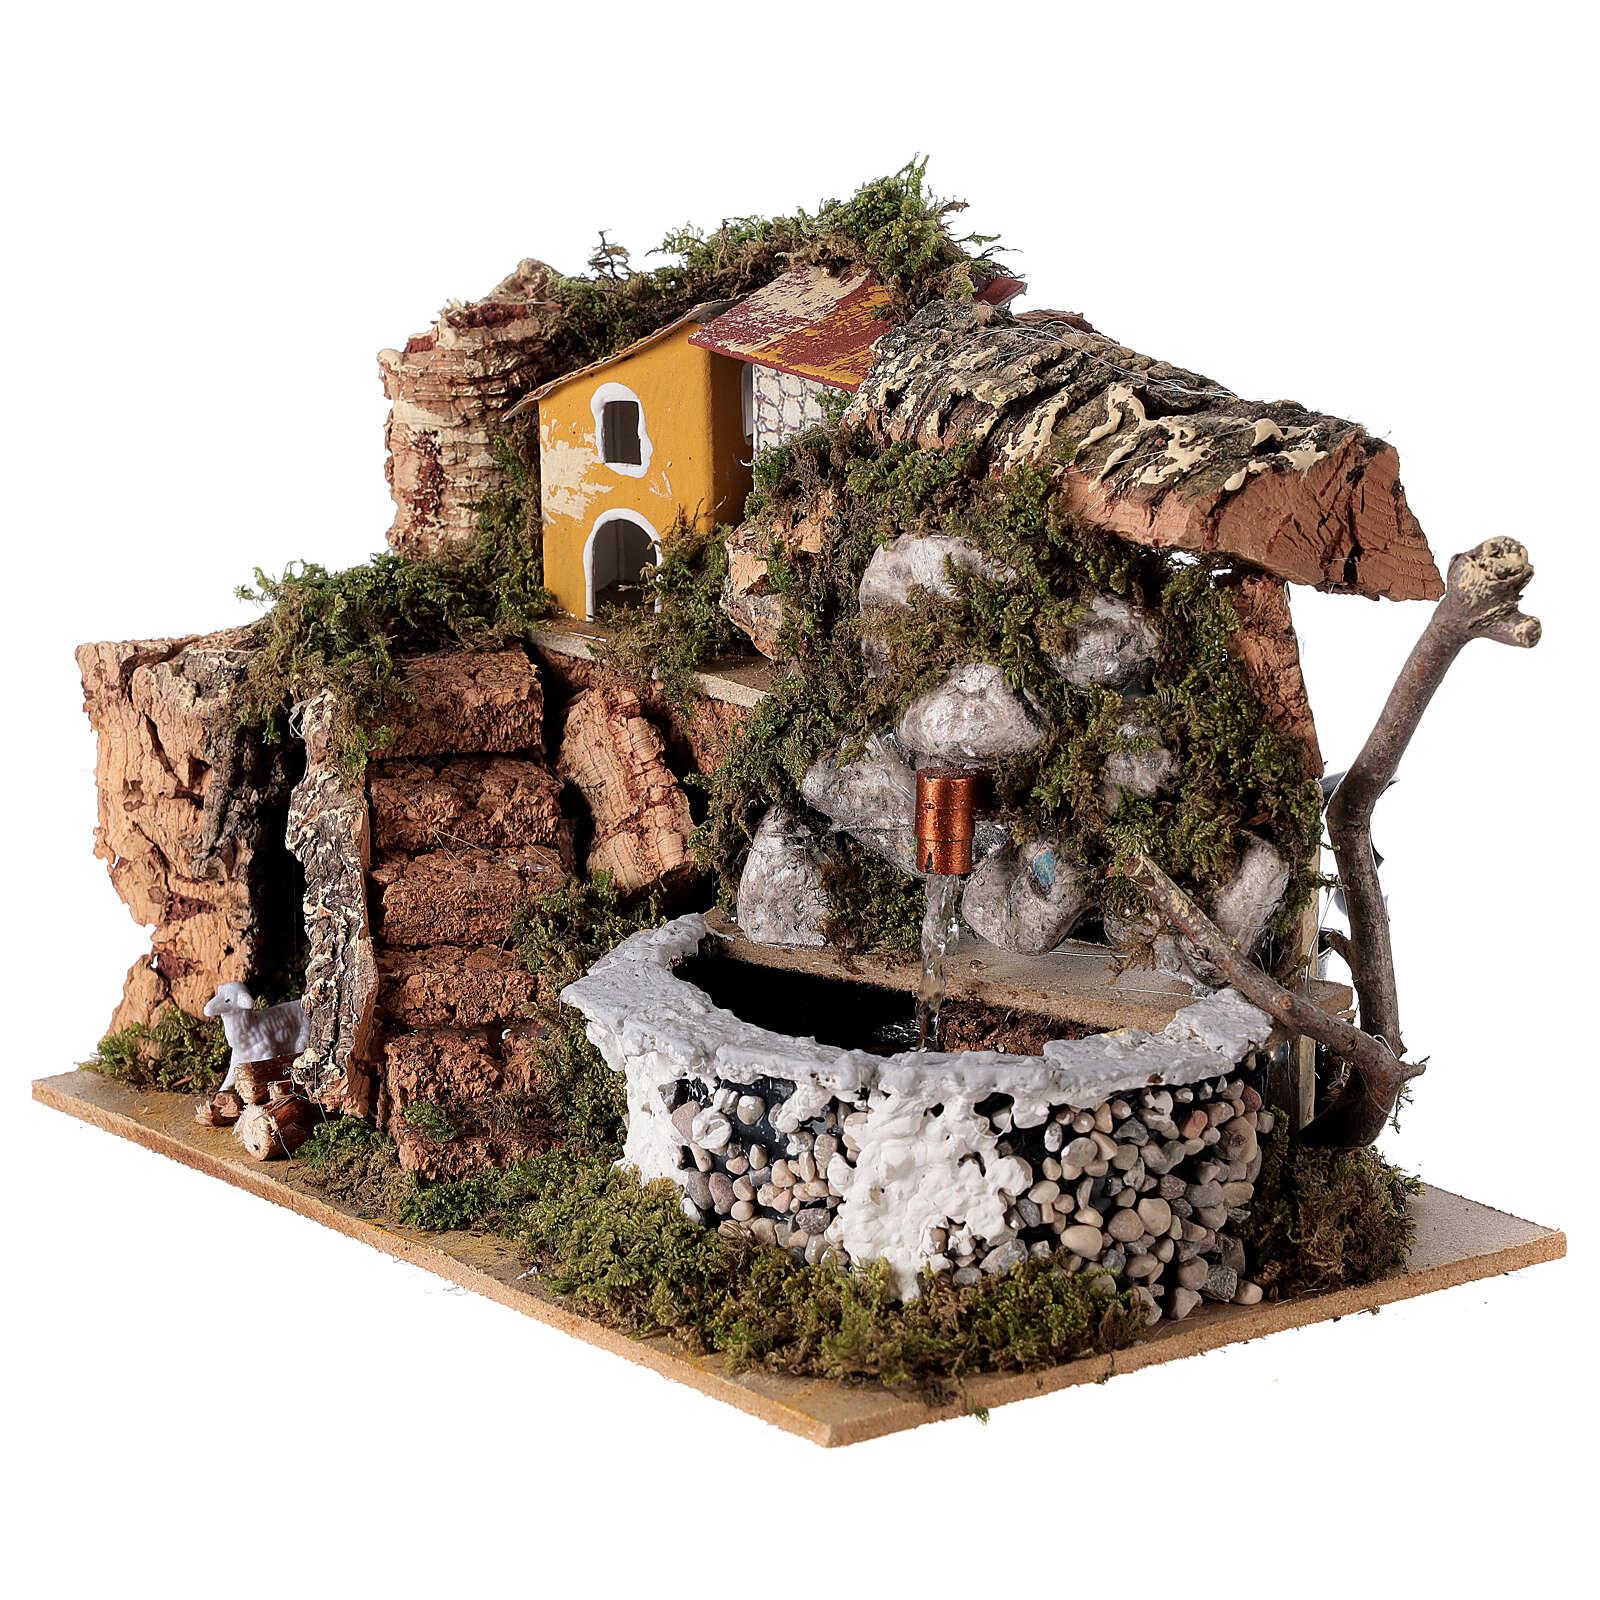 Fuente belén de piedra 15x20x15 cm para belenes 8-10 cm 4